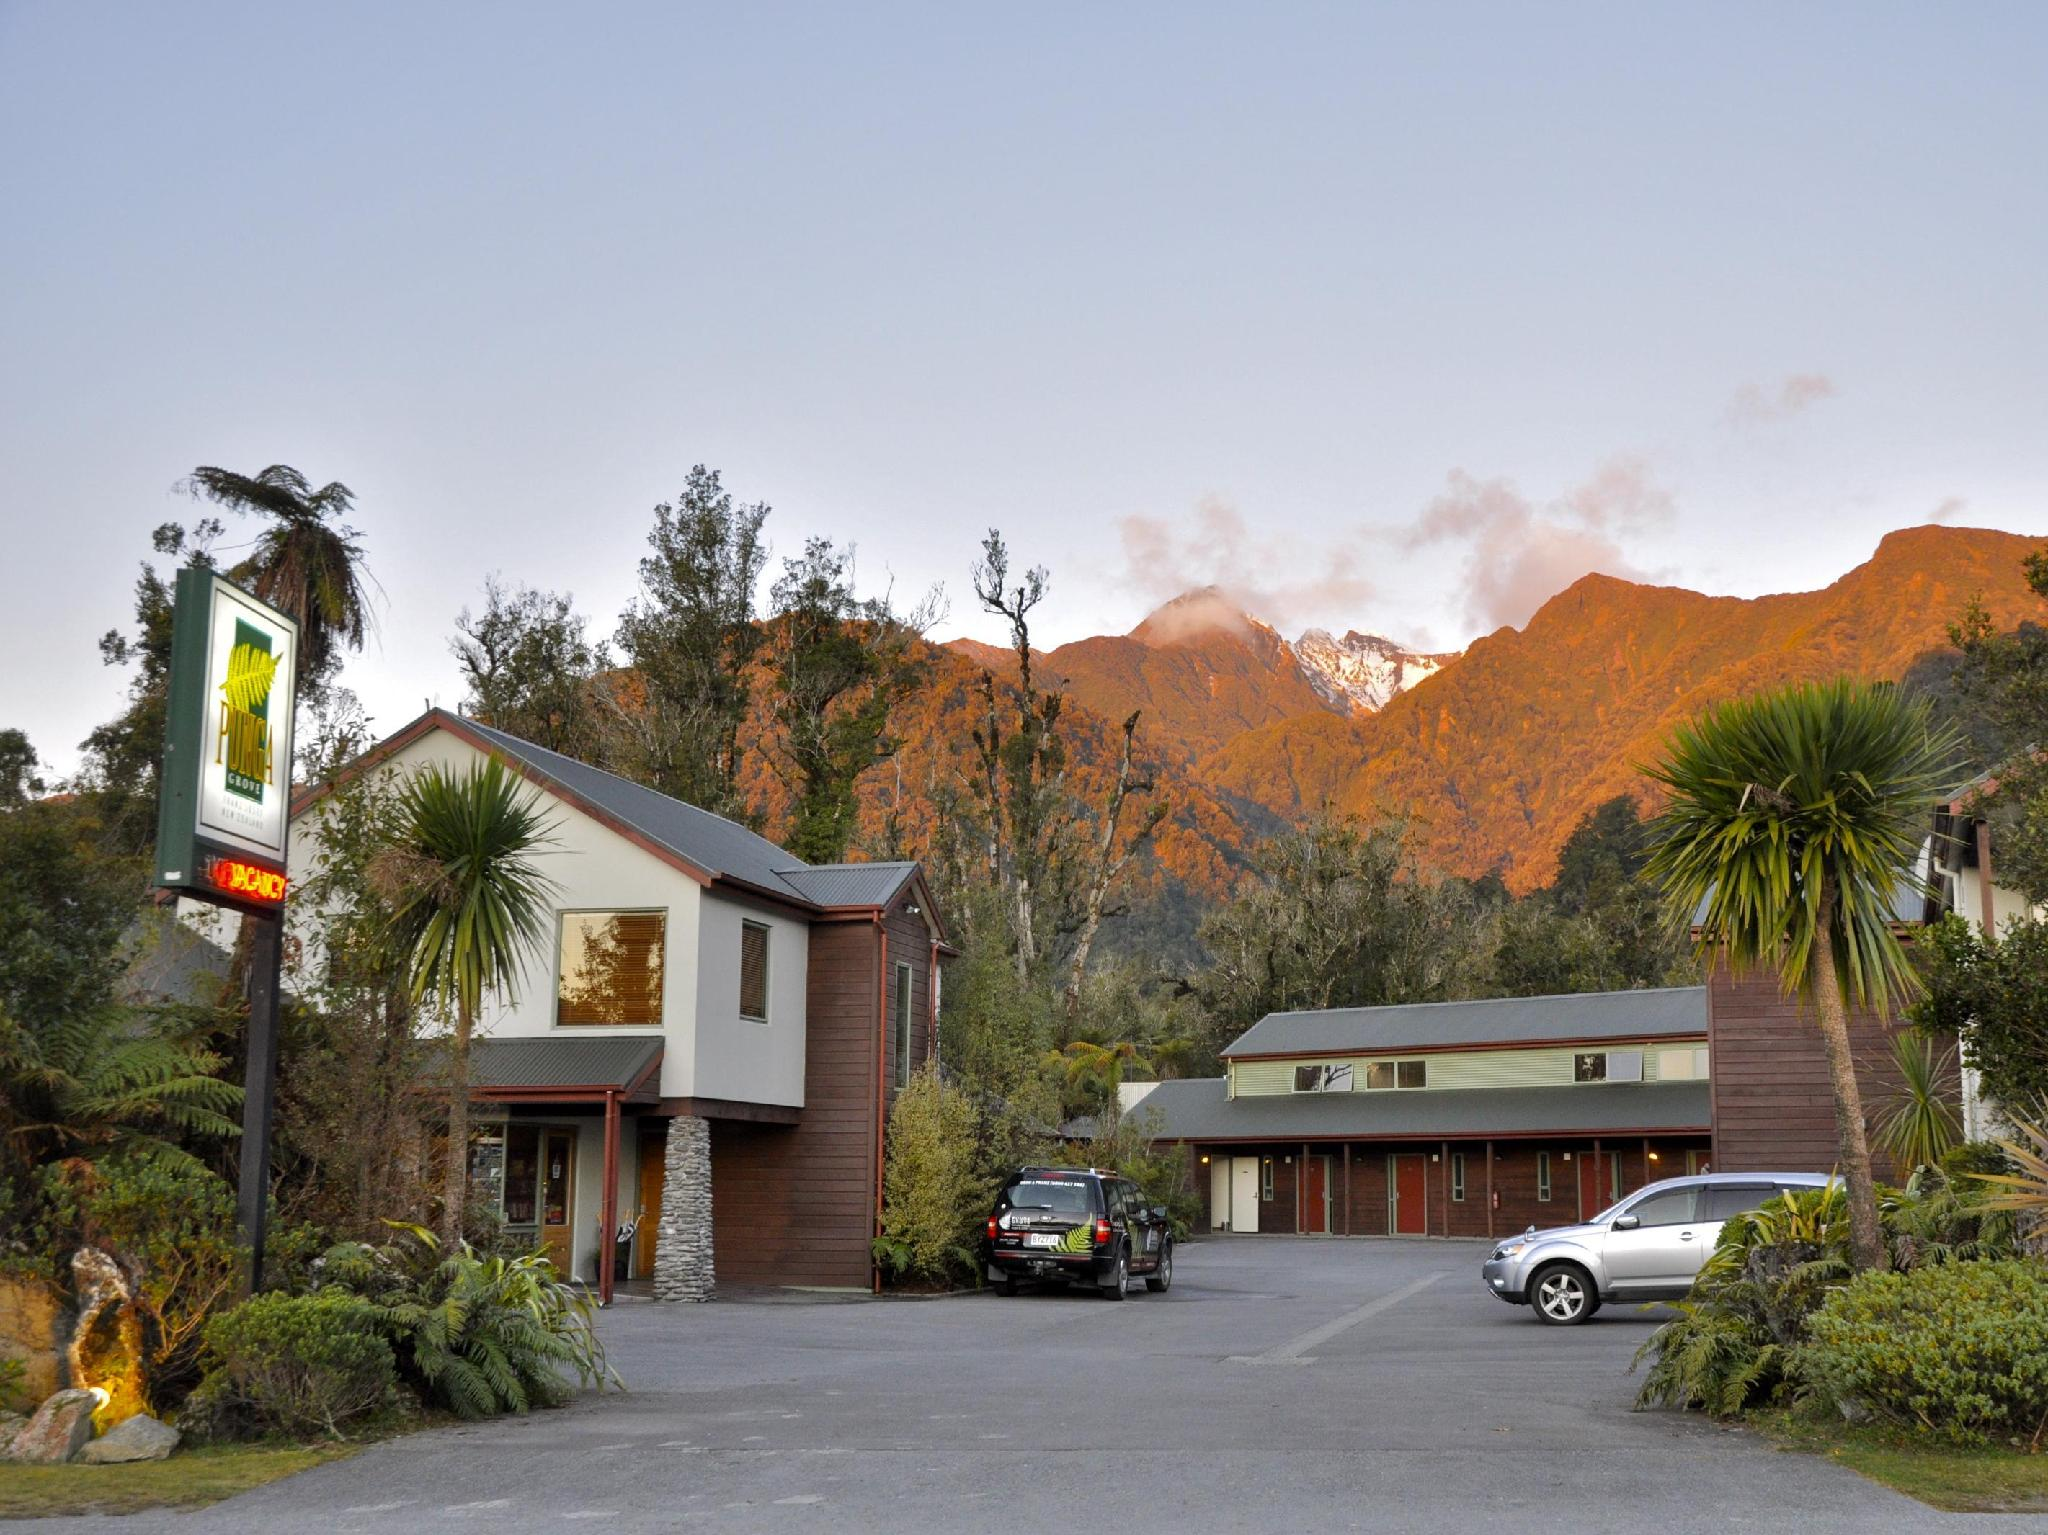 Punga Grove Hotel - Franz Josef Glacier